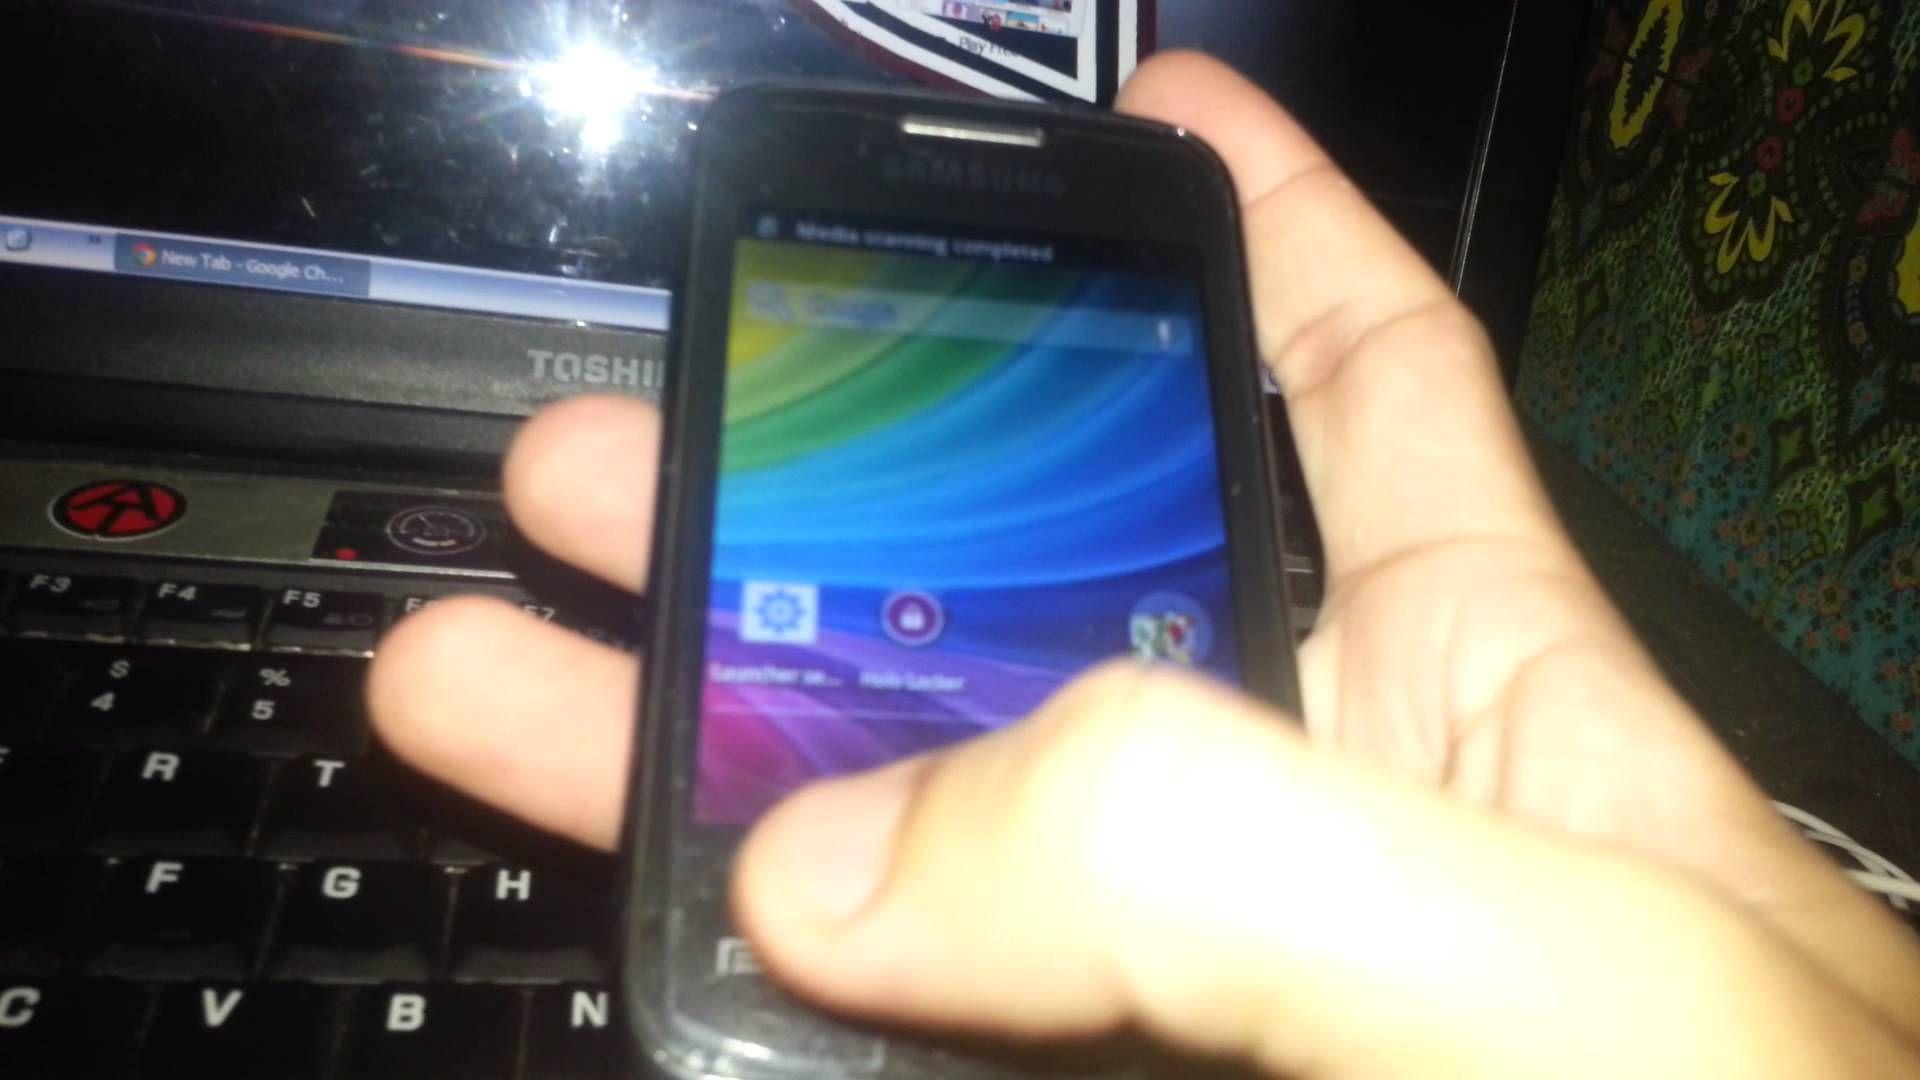 Gallery for gt samsung galaxy s6102 - Free Samsung Gt S6102 Galaxy Y Duos Magic Fish Aquarium Live